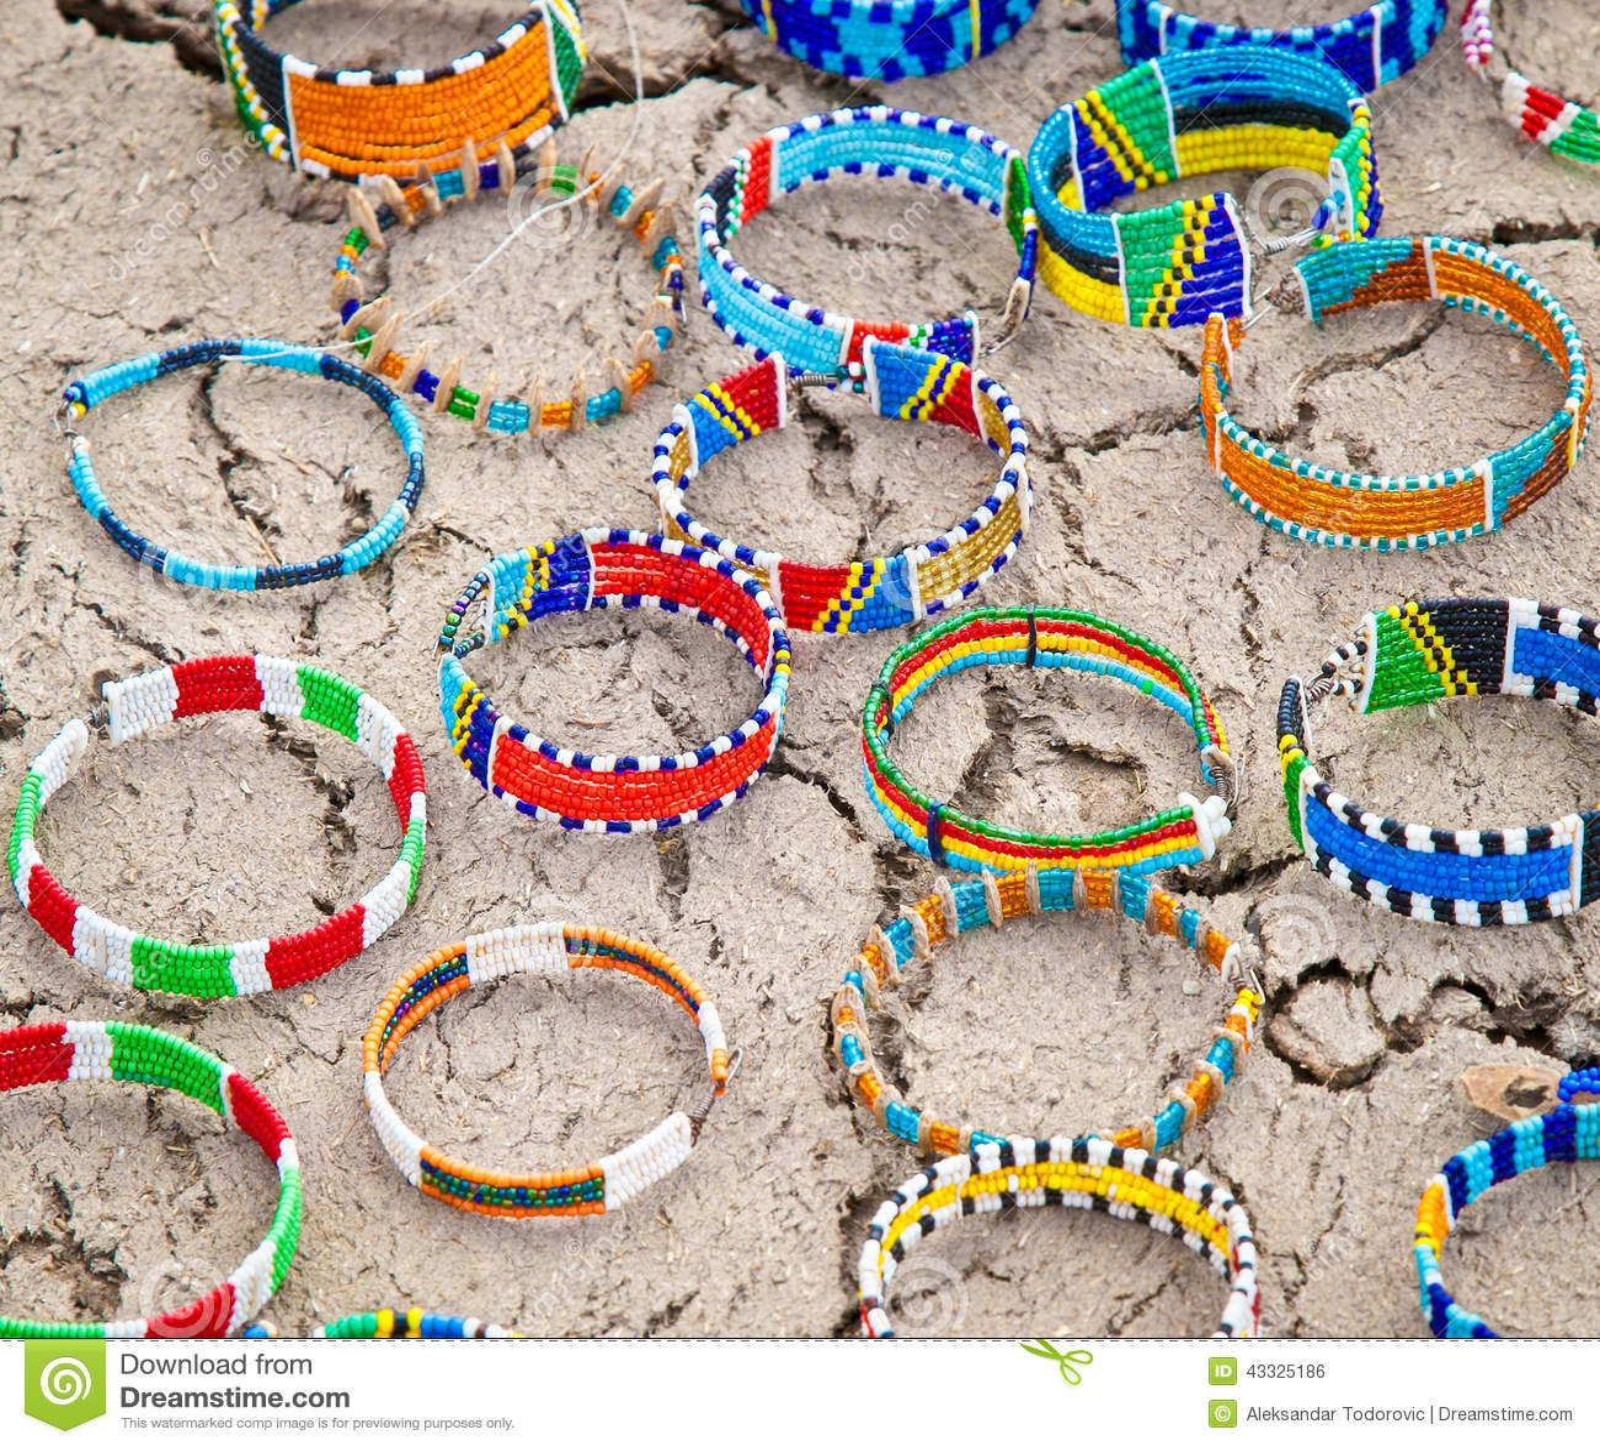 Masai traditional jewelry in village market, Tanzania.